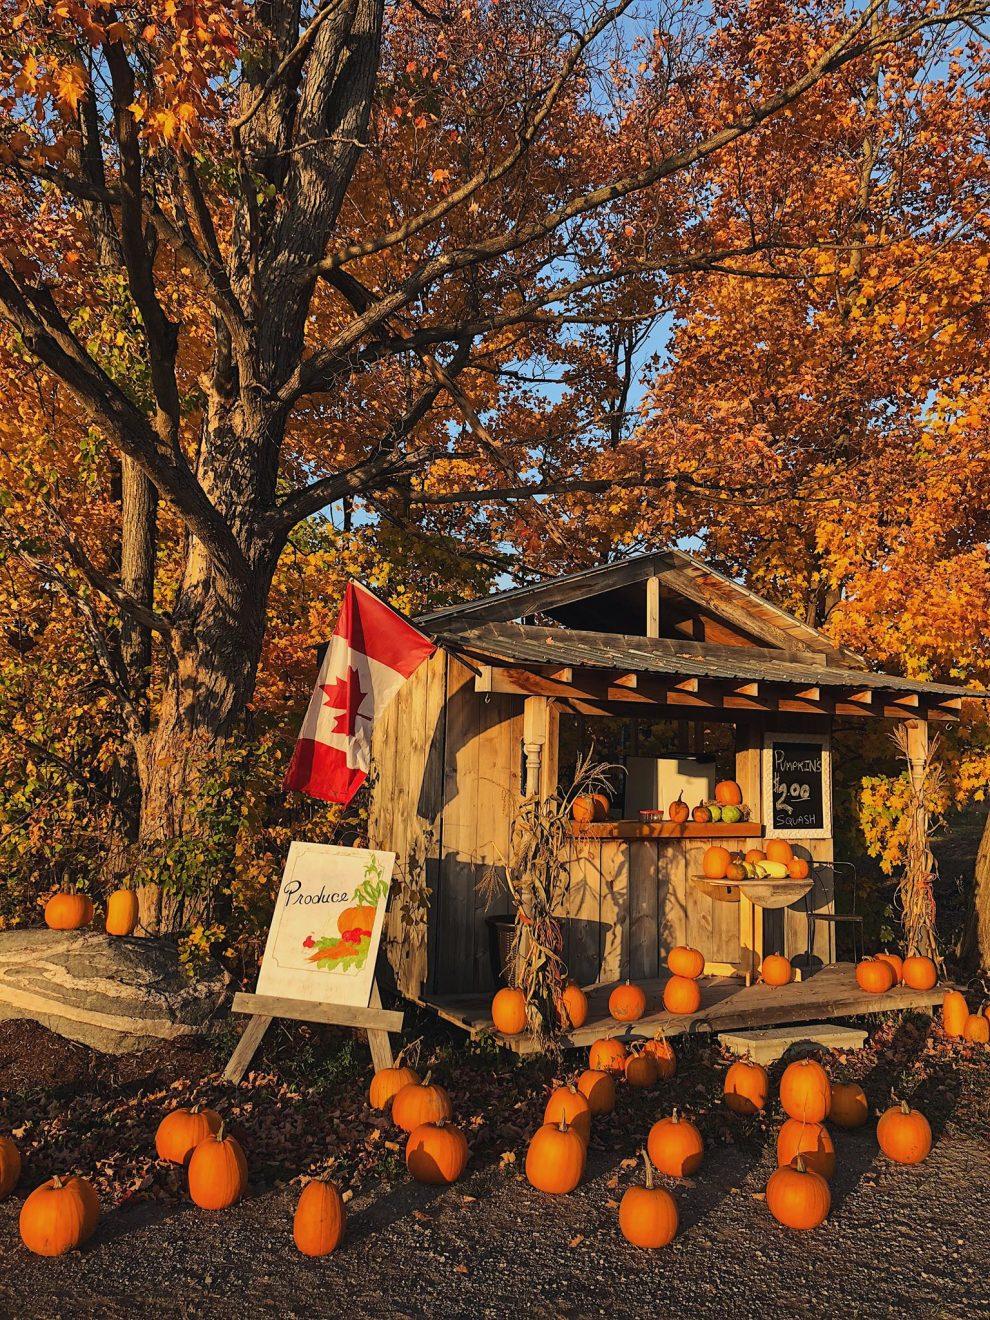 Oost Canada roadtrip. De mooiste route van Montréal naar Toronto. Rondreis Oost Canada. Algonquin Provincial Park